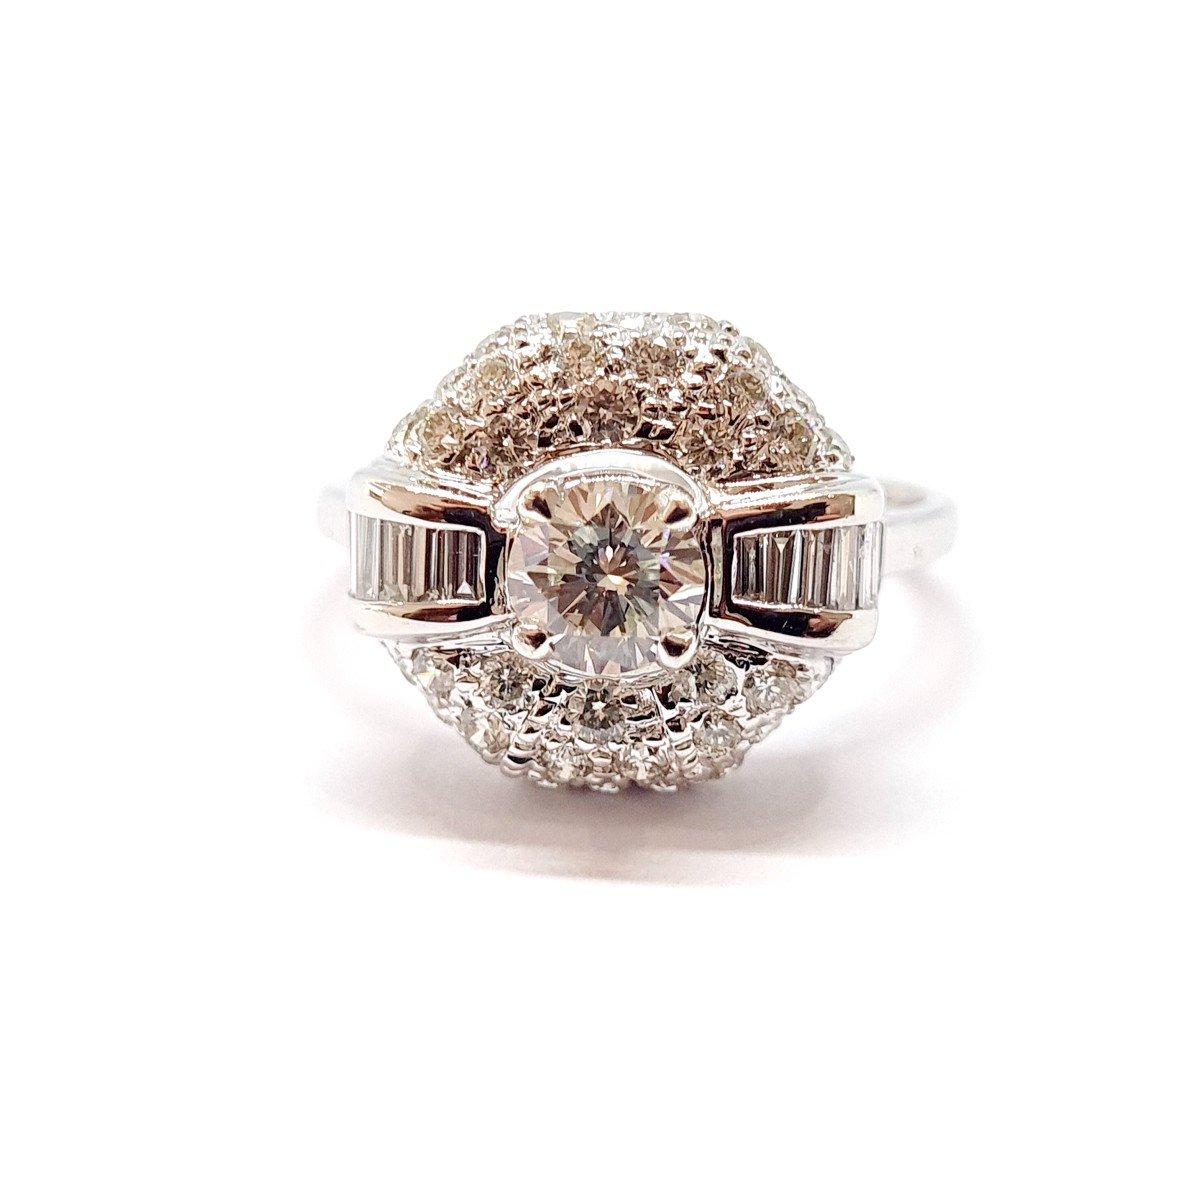 Art Deco Ring (1920 - 1935) 18k White Gold Diamonds